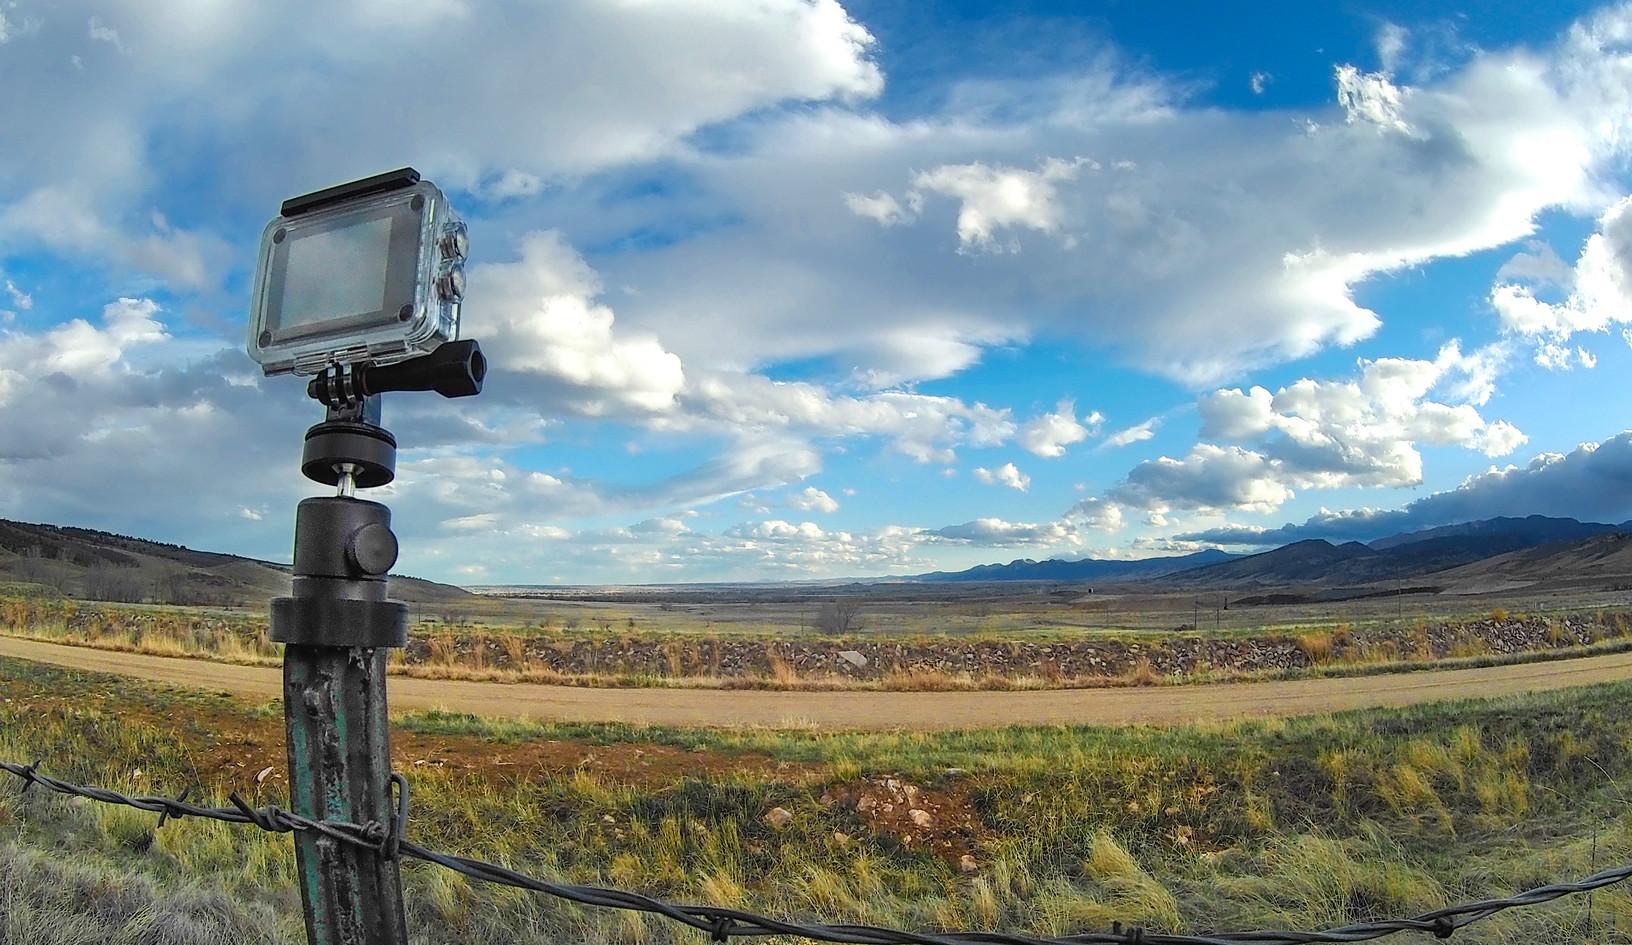 Mag Action Cam on Metal Post-1.jpg